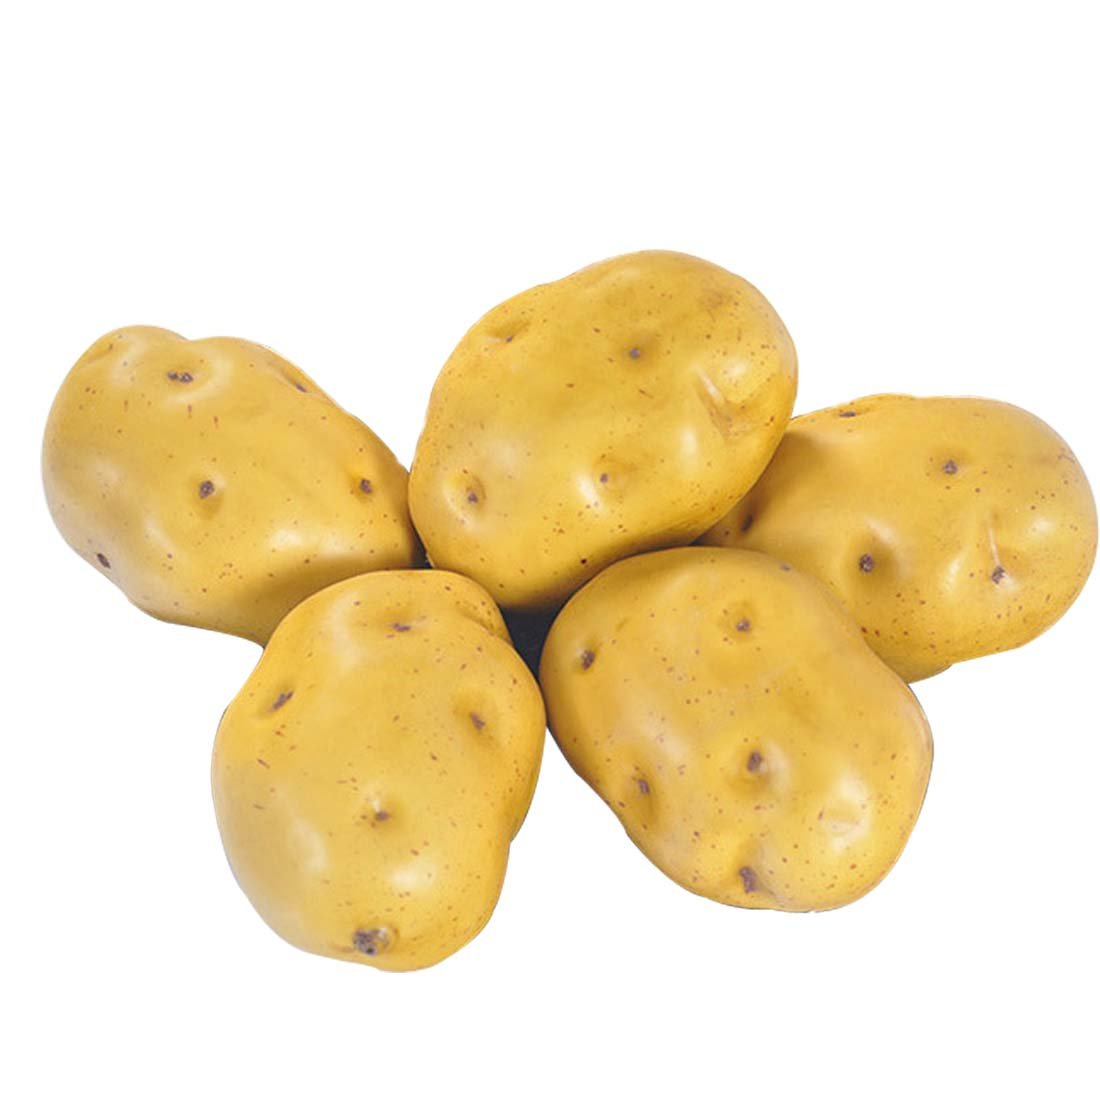 Artificial Potatoes Lifelike Fake Potatoes Simulation Vegetable Home Kitchen Decoration 5pcs